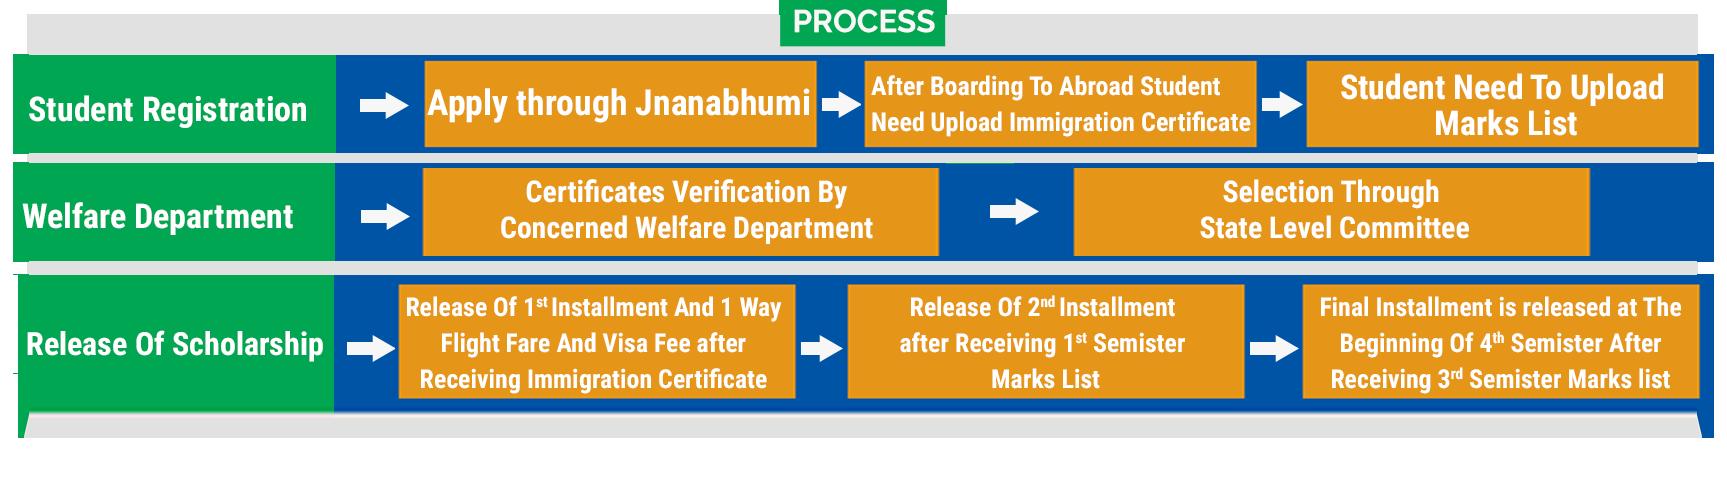 Jnanabhumi Overseas Education Scheme Process Flowchart